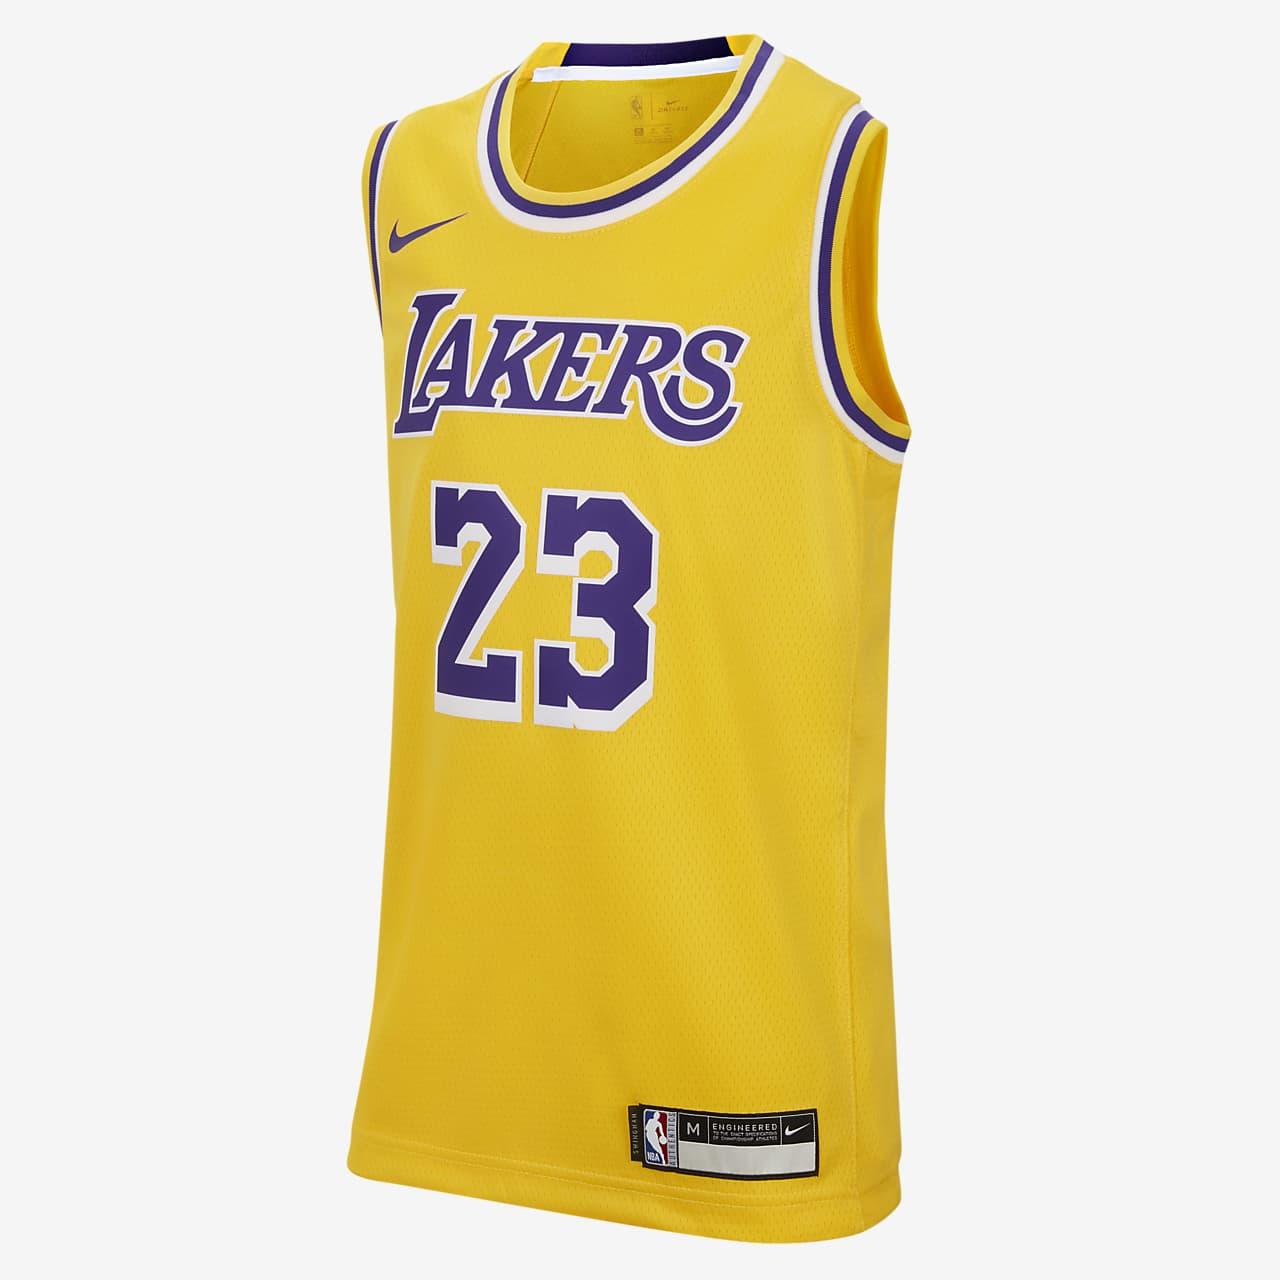 洛杉矶湖人队 Icon Edition SwingmanNike NBA Jersey大童(男孩)球衣